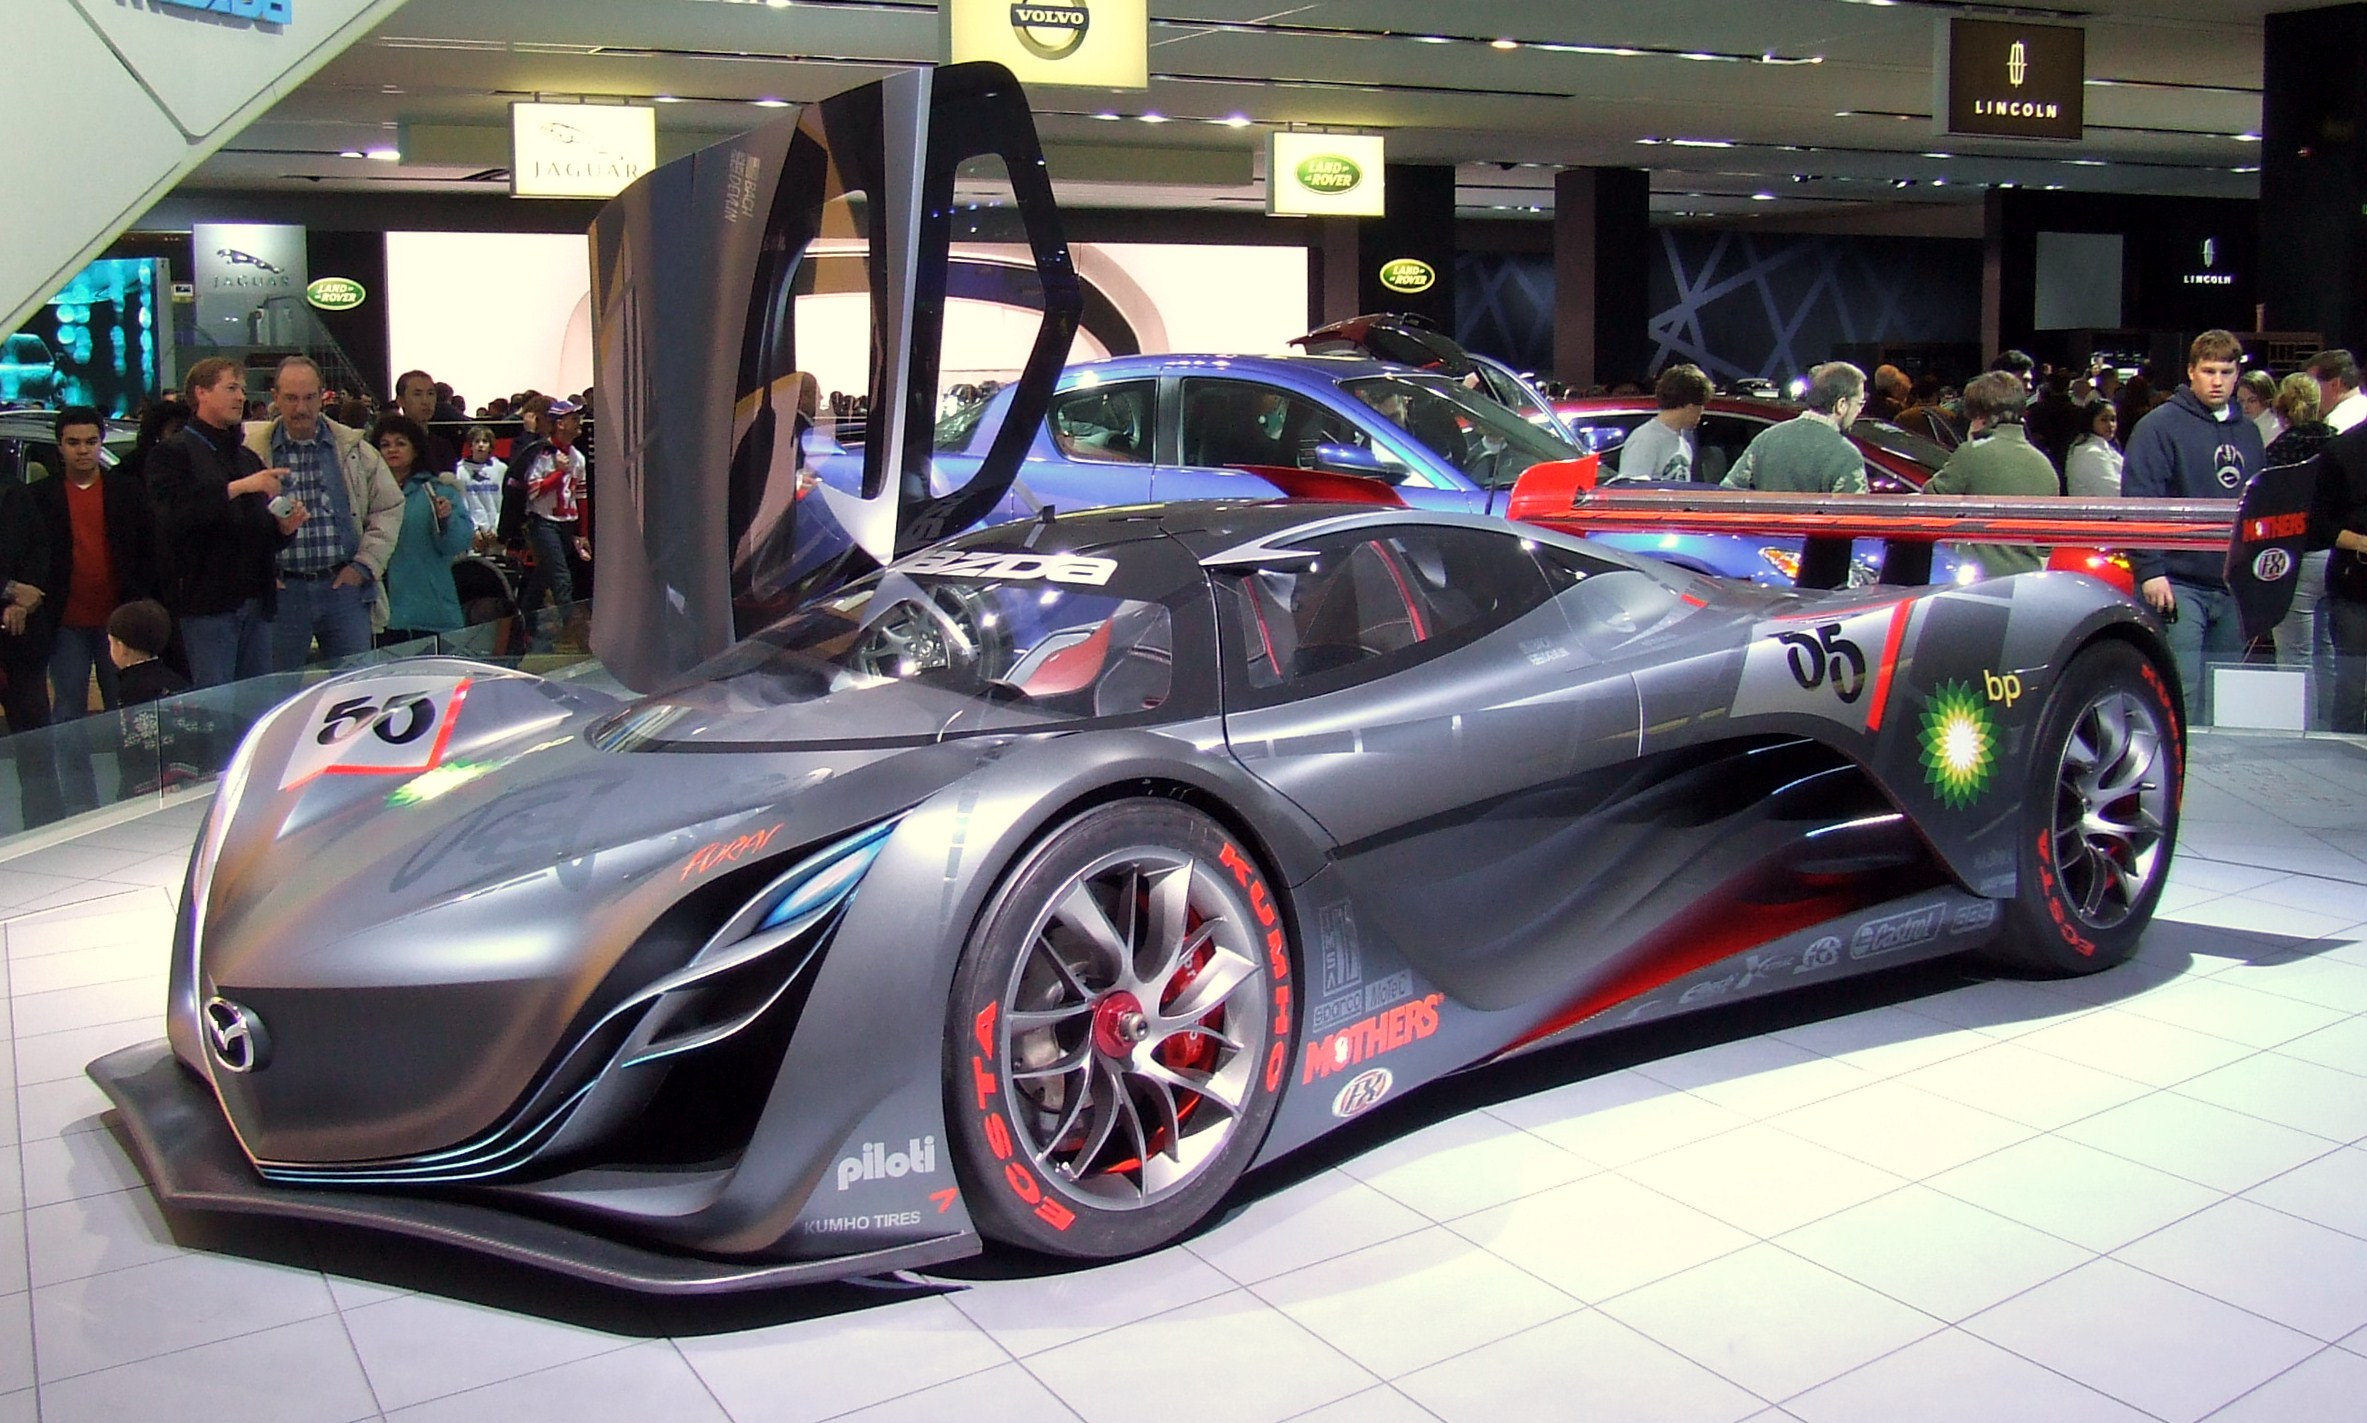 Mazda Furai Vehículos Supercars Hd Fondos De Pantalla: Mazda Furai Fondos De Pantalla, Fondos De Escritorio